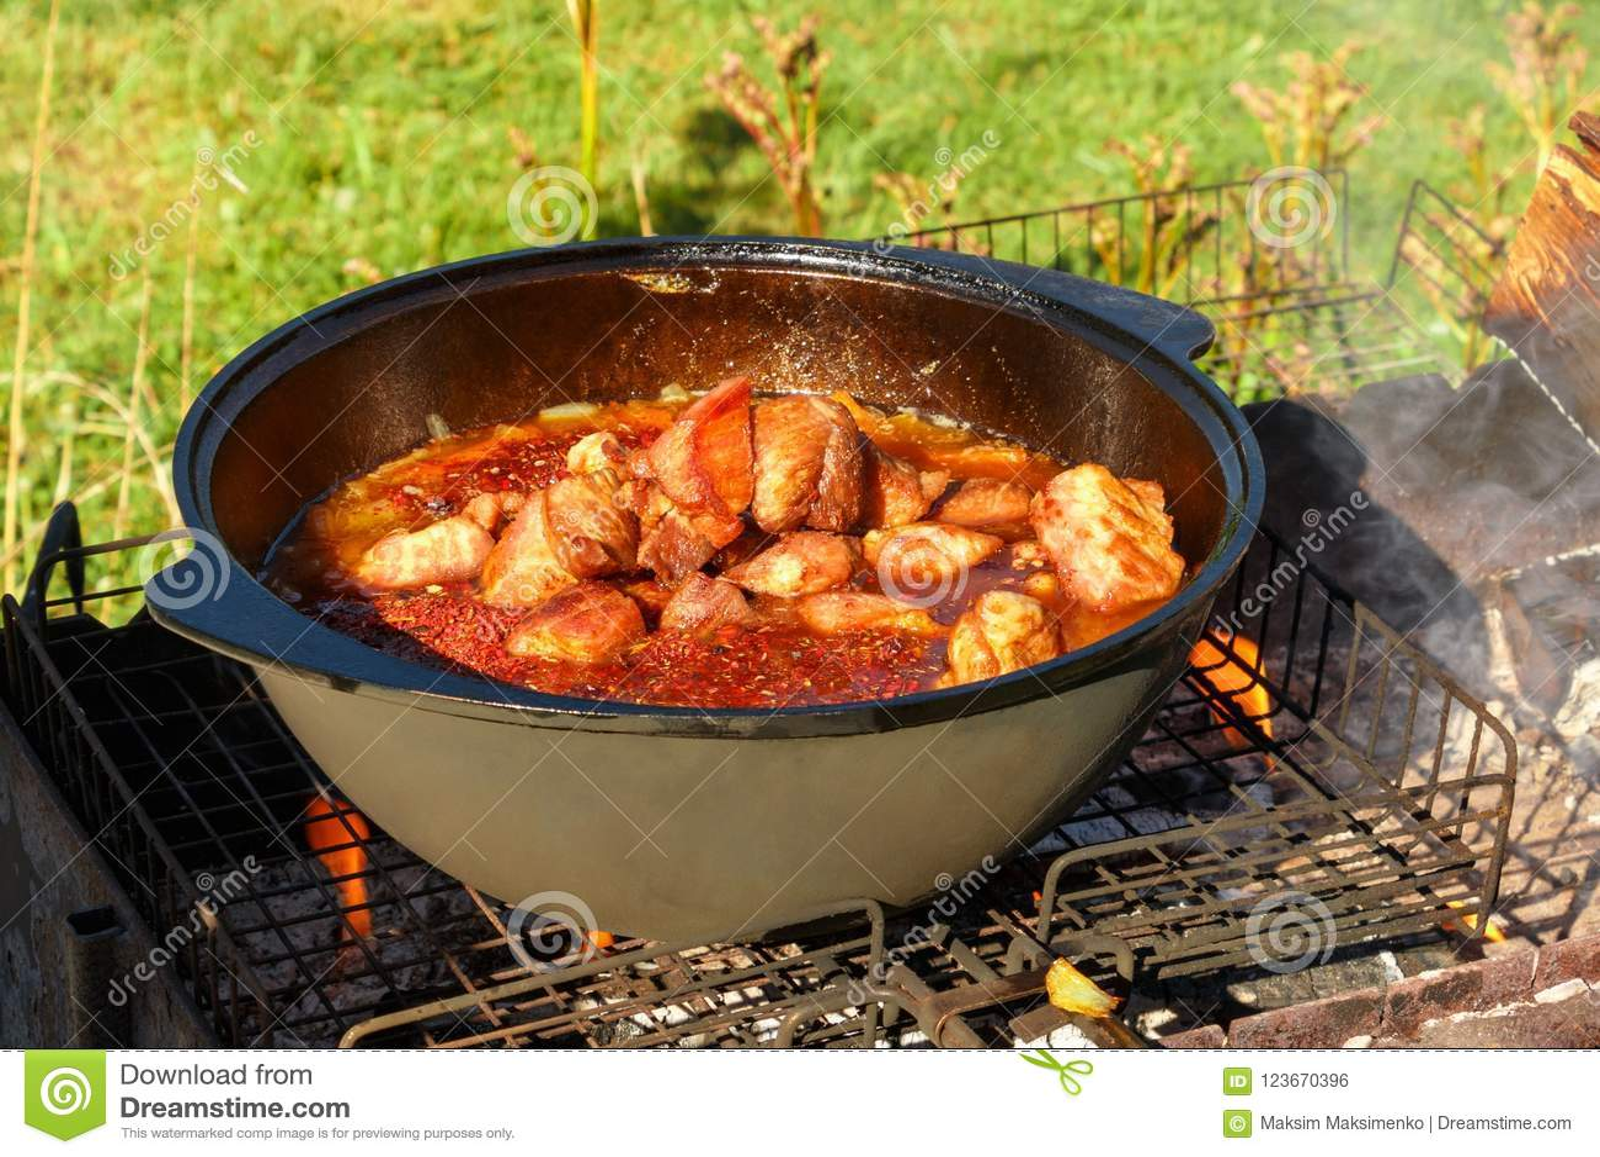 Meat with vegetables in a cauldron. Recipe. Uzbek cuisine 88